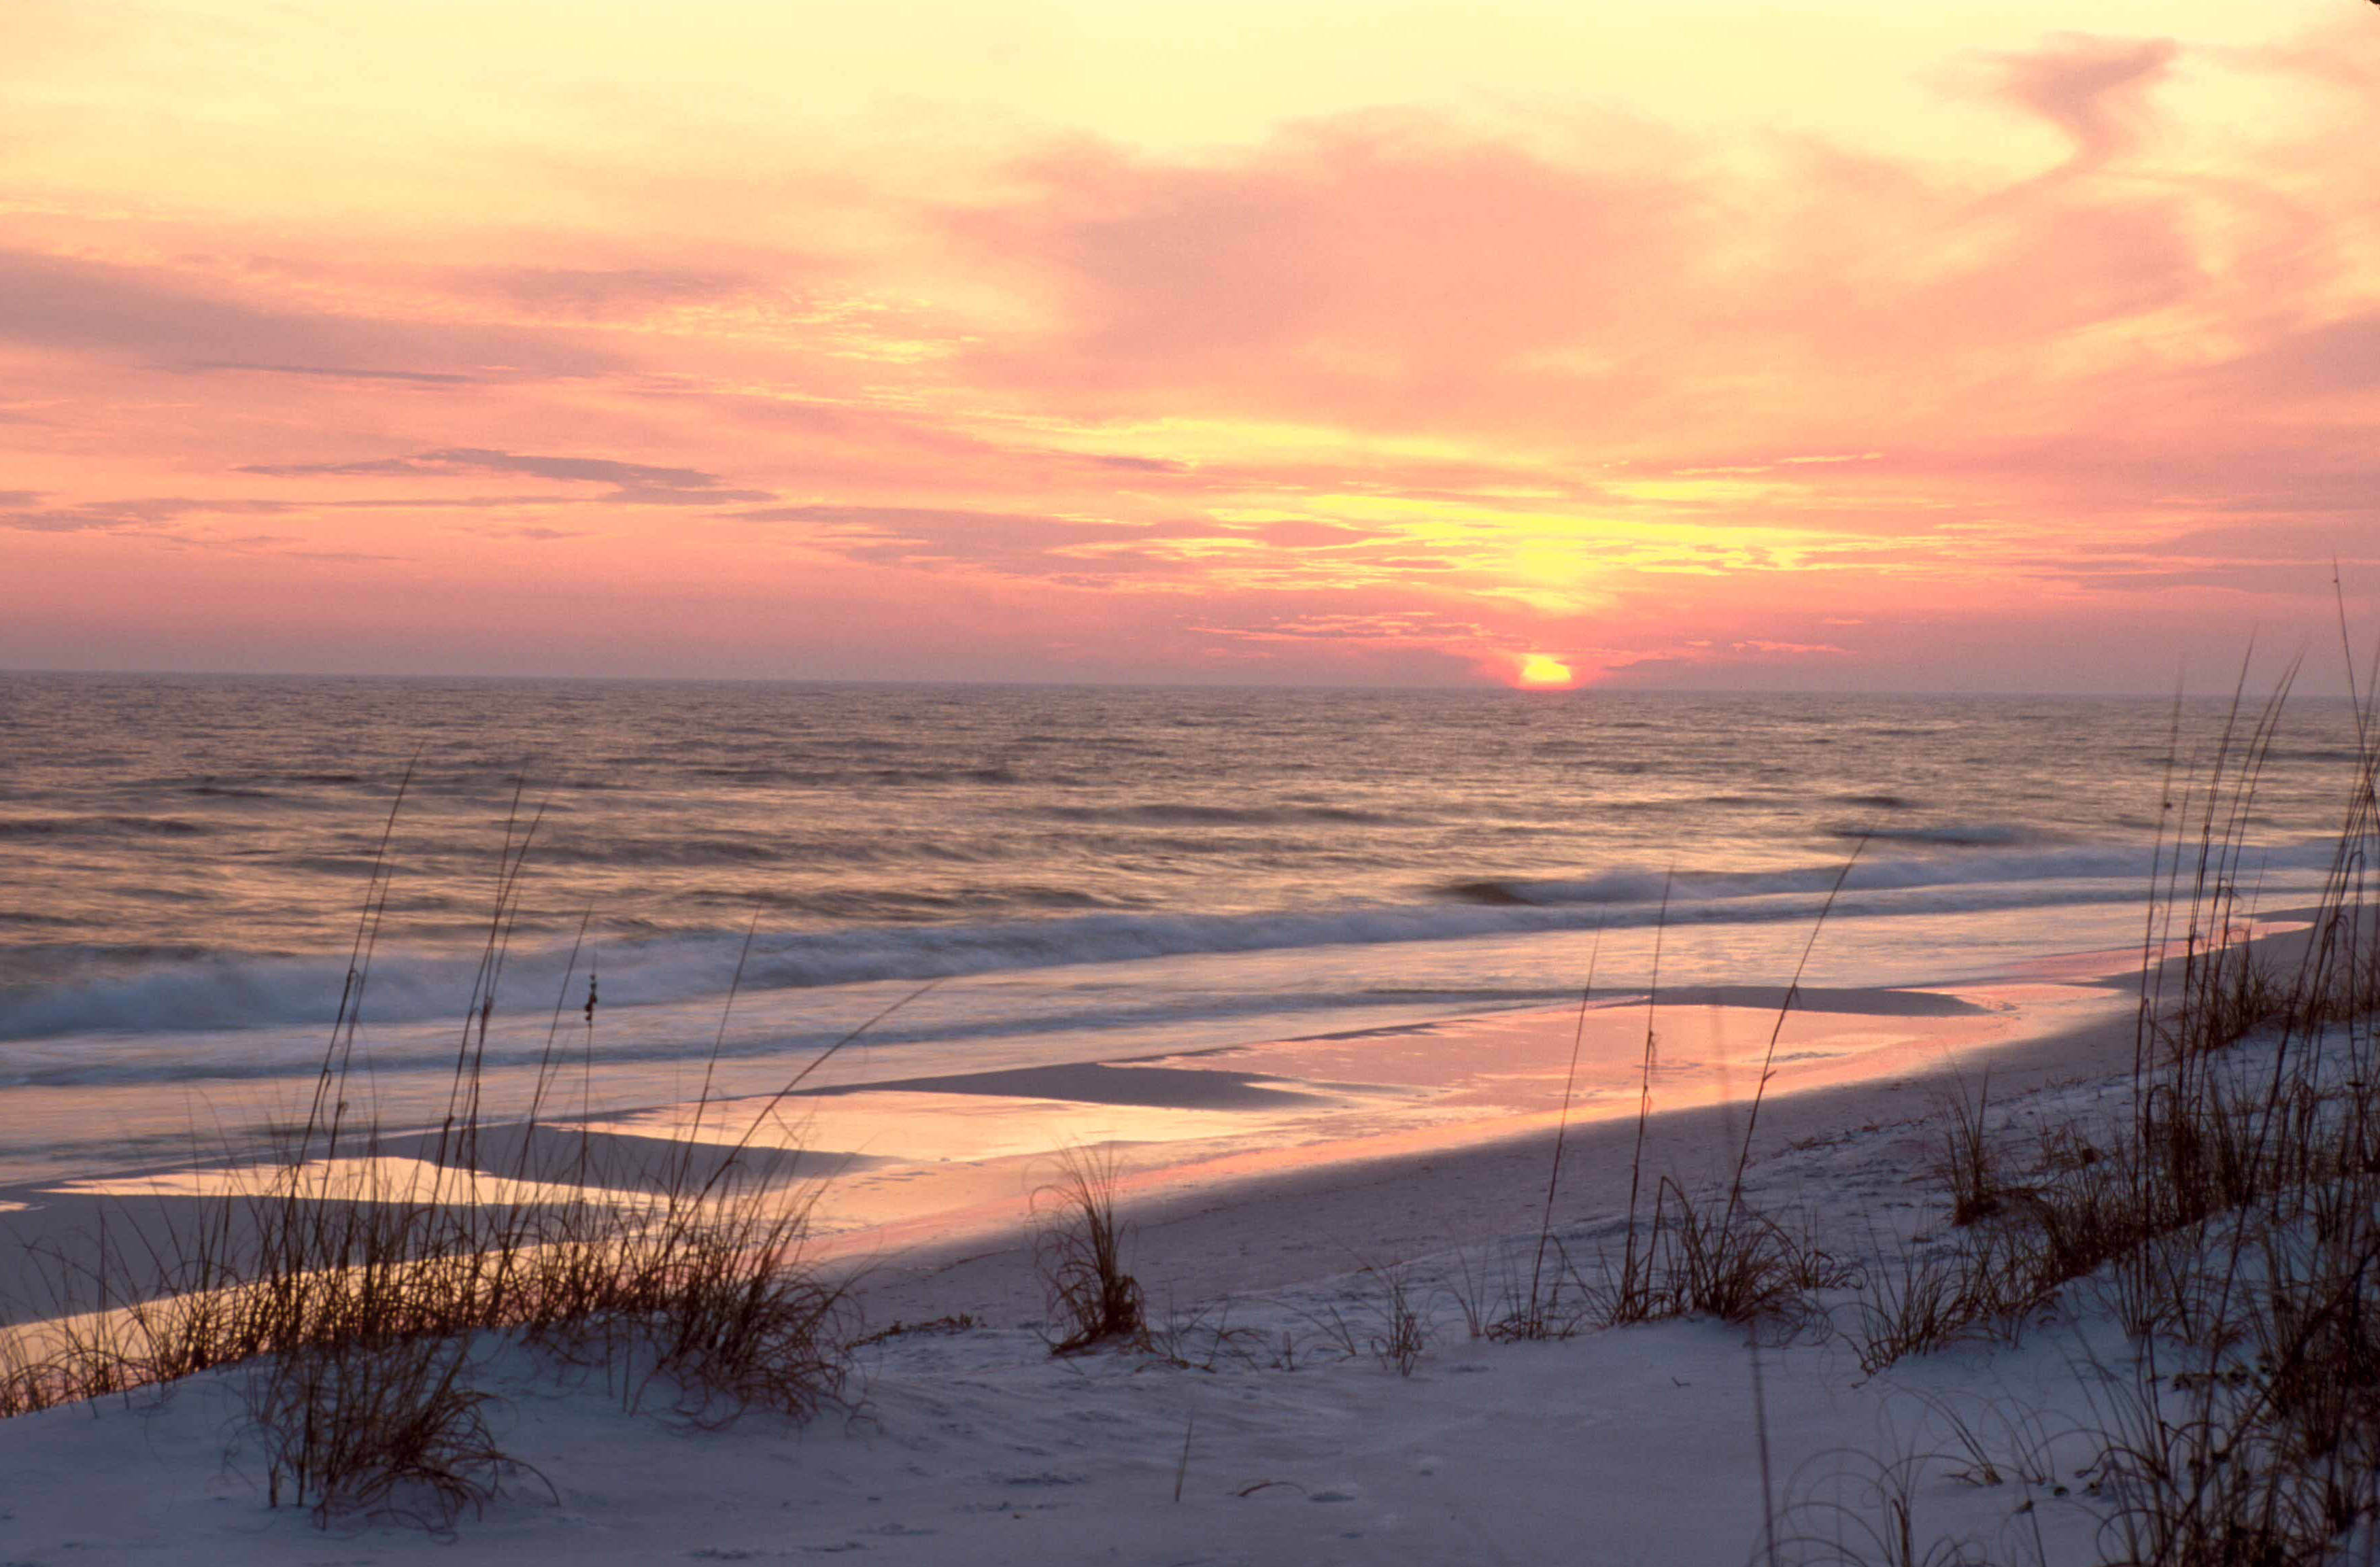 Gulf Shores, Alabama sunset